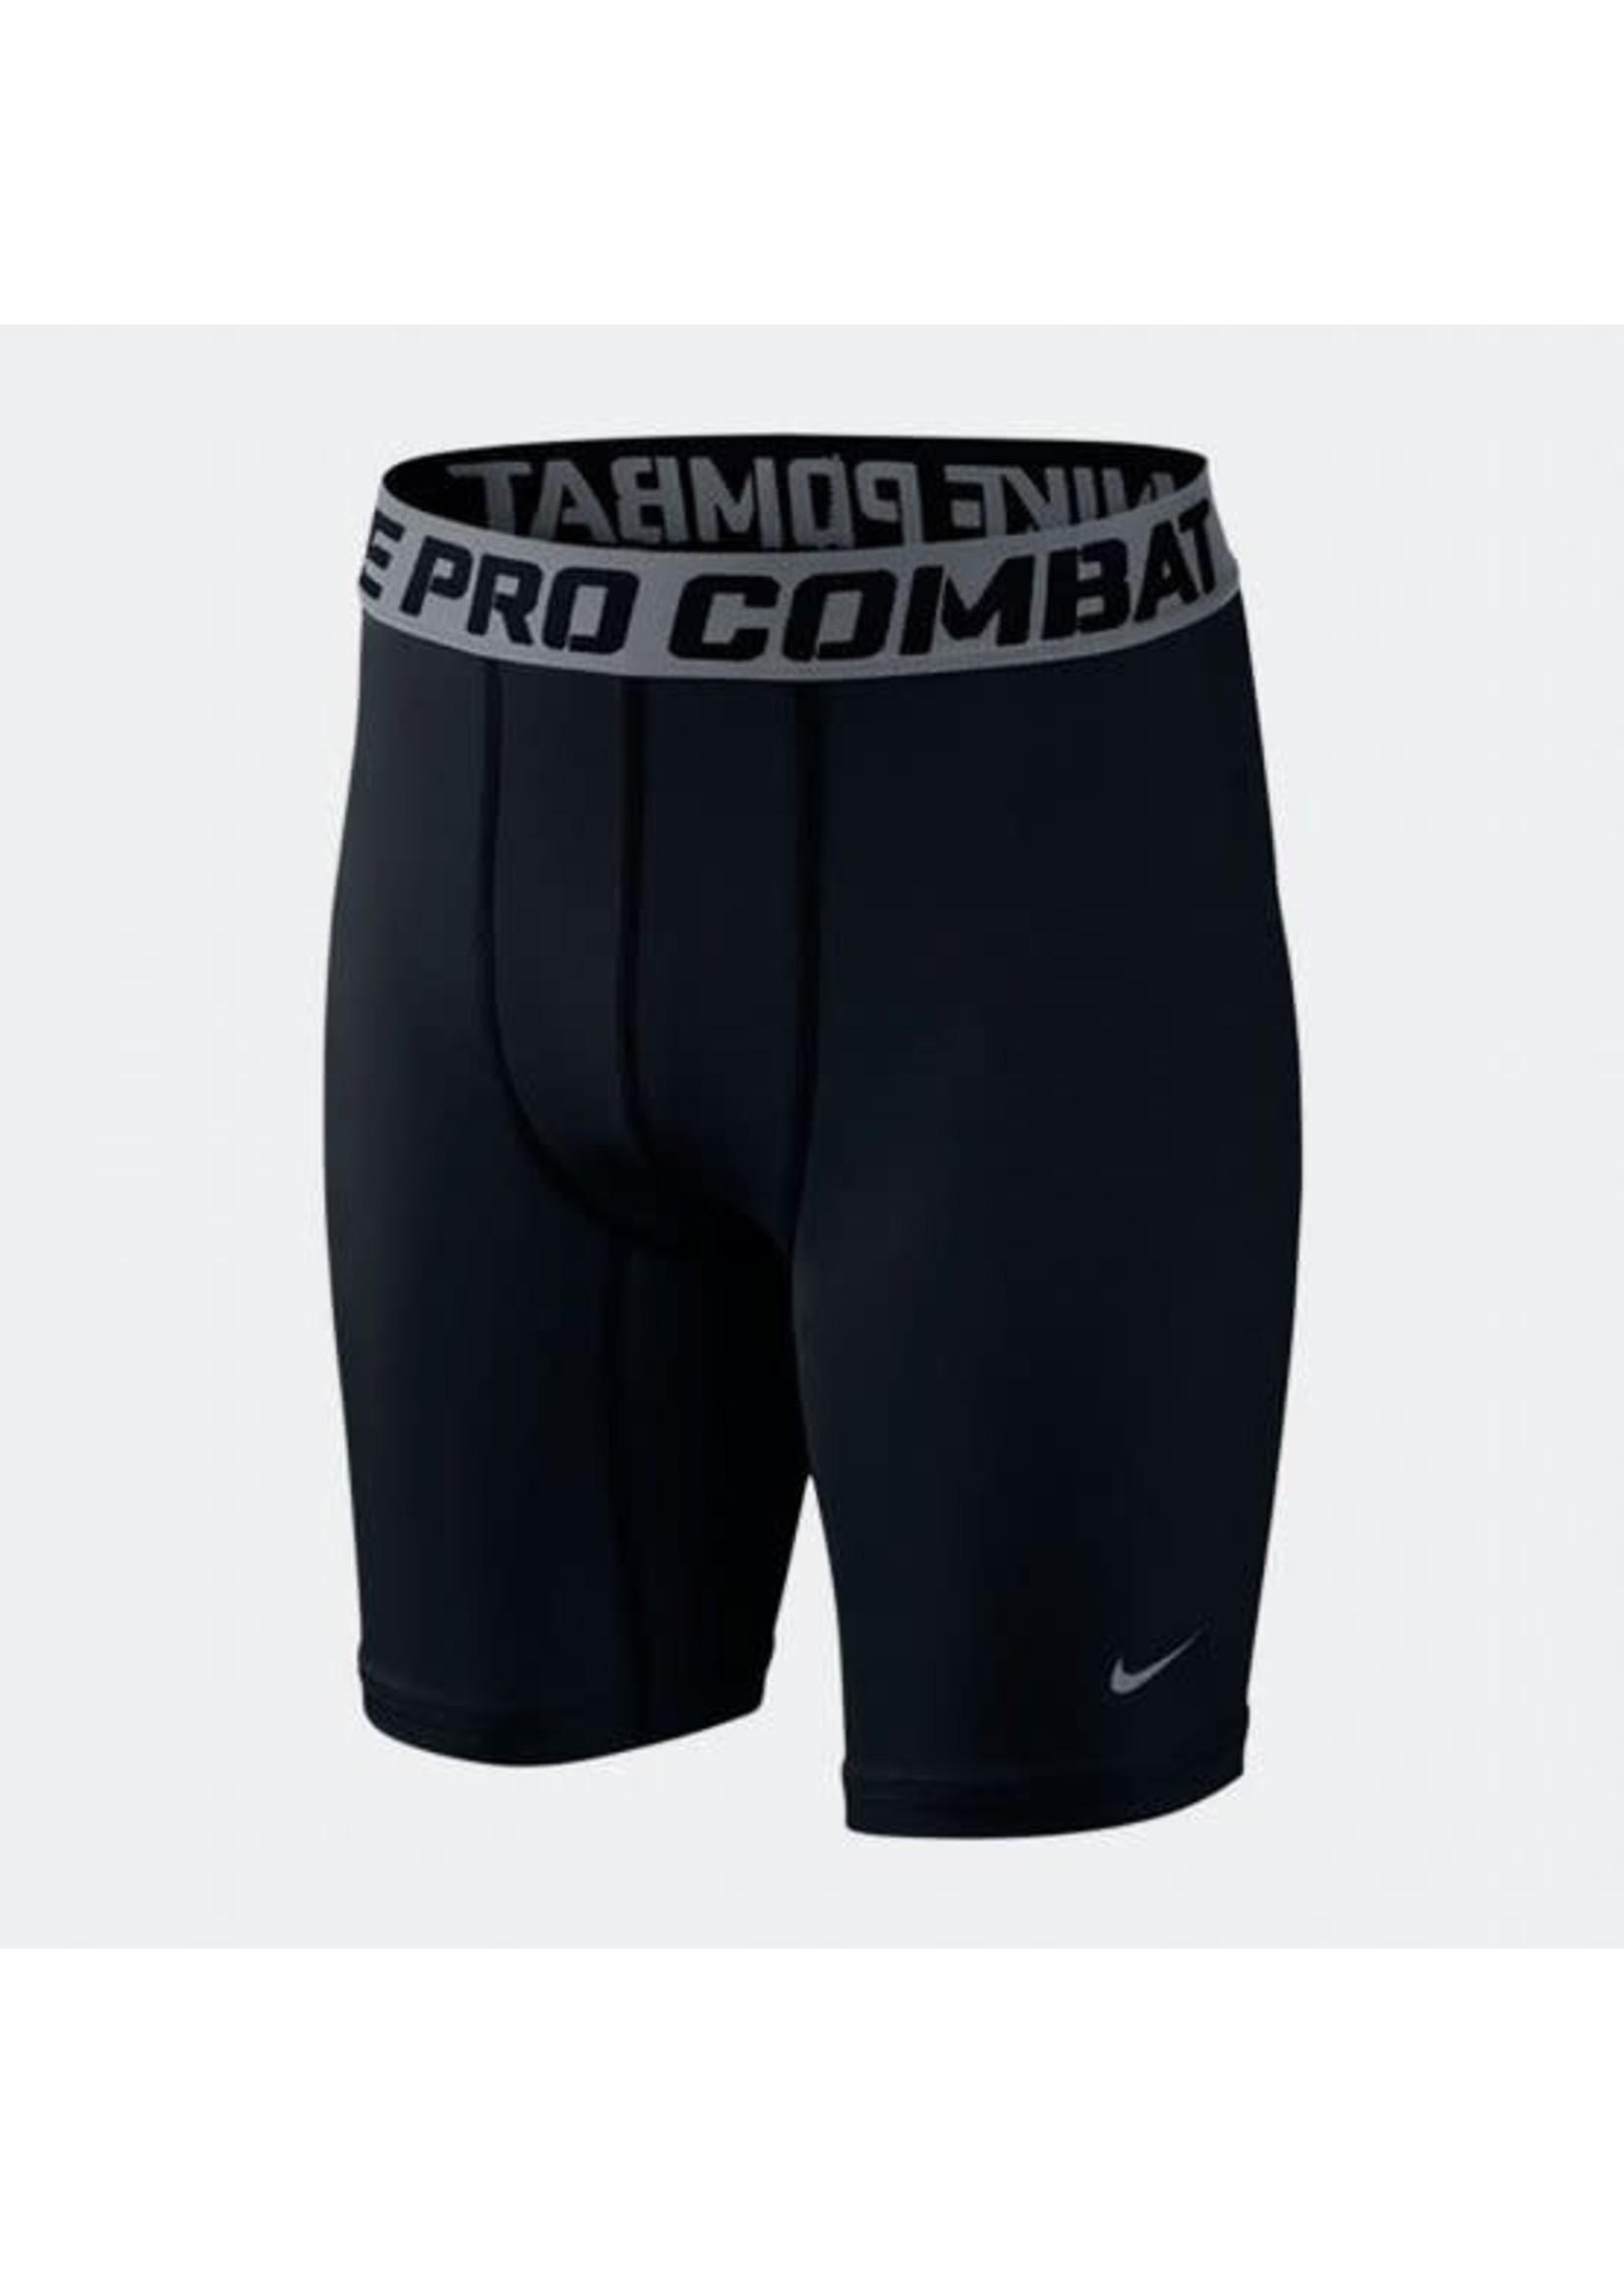 Nike Pro Combat Dri-Fit Compression Shorts